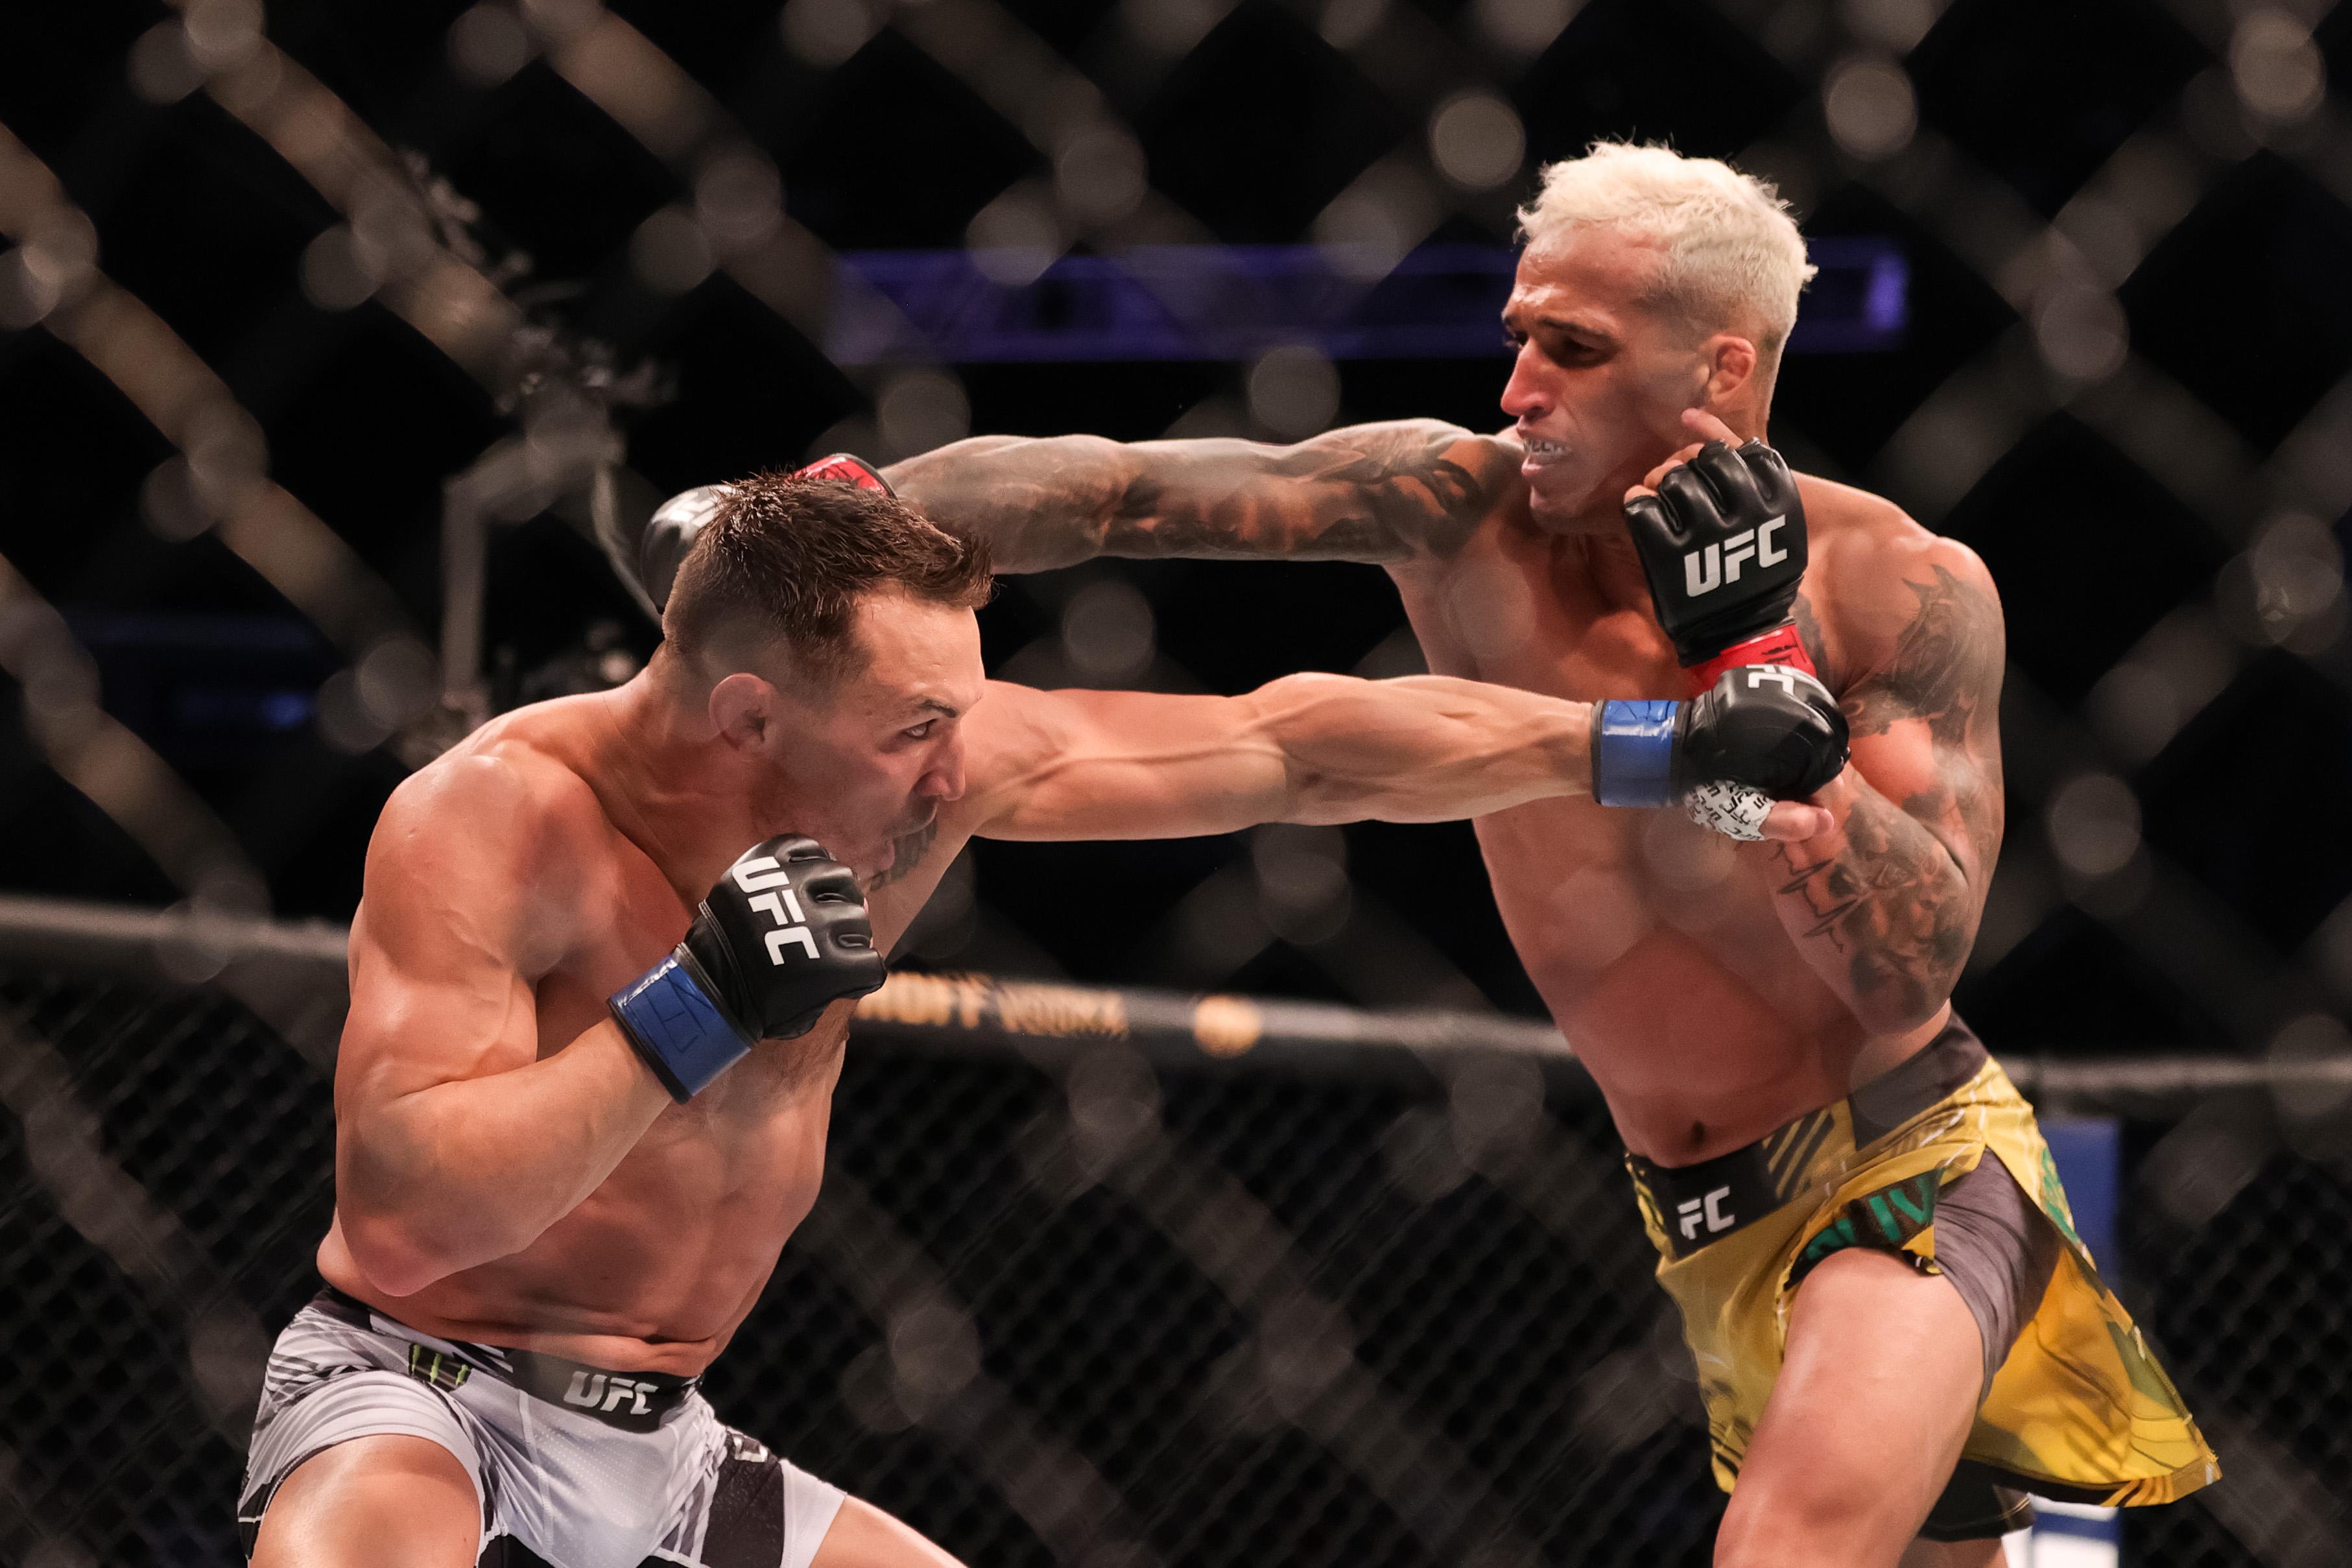 UFC 262: Oliveira ushers in new lightweight era with Chandler finish - CGTN